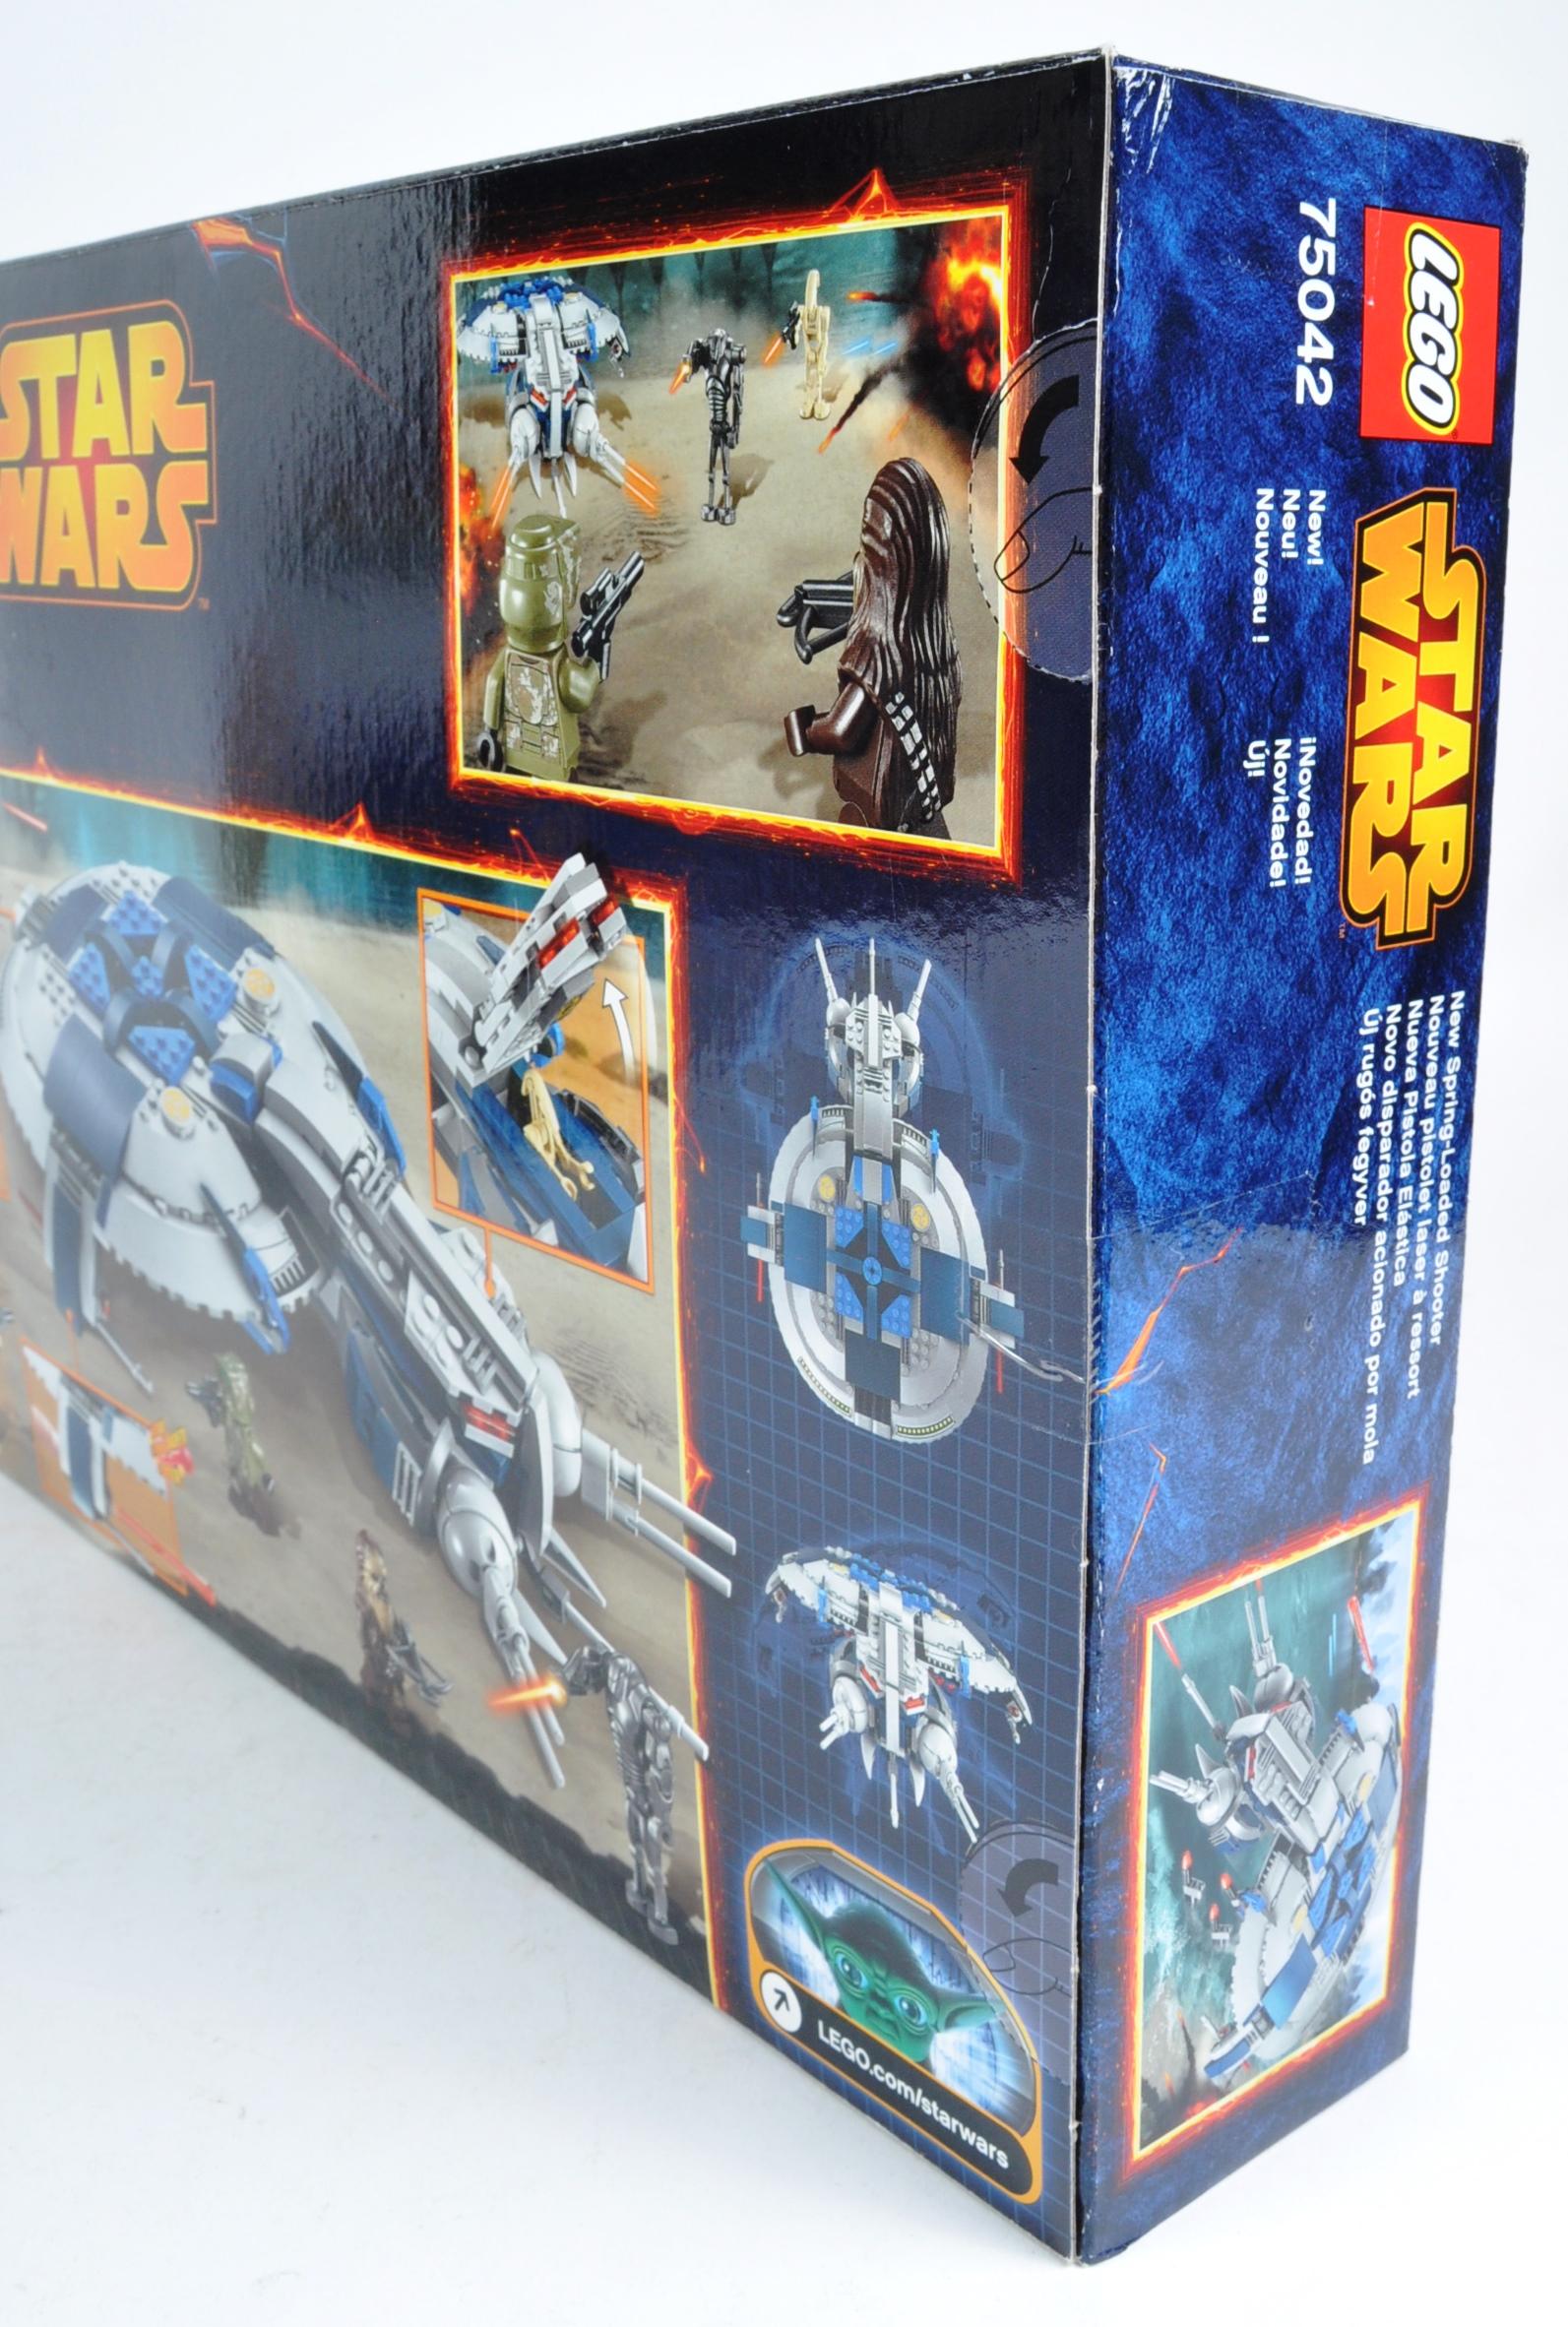 LEGO SETS - LEGO STAR WARS - 75041 / 75042 - Image 3 of 6